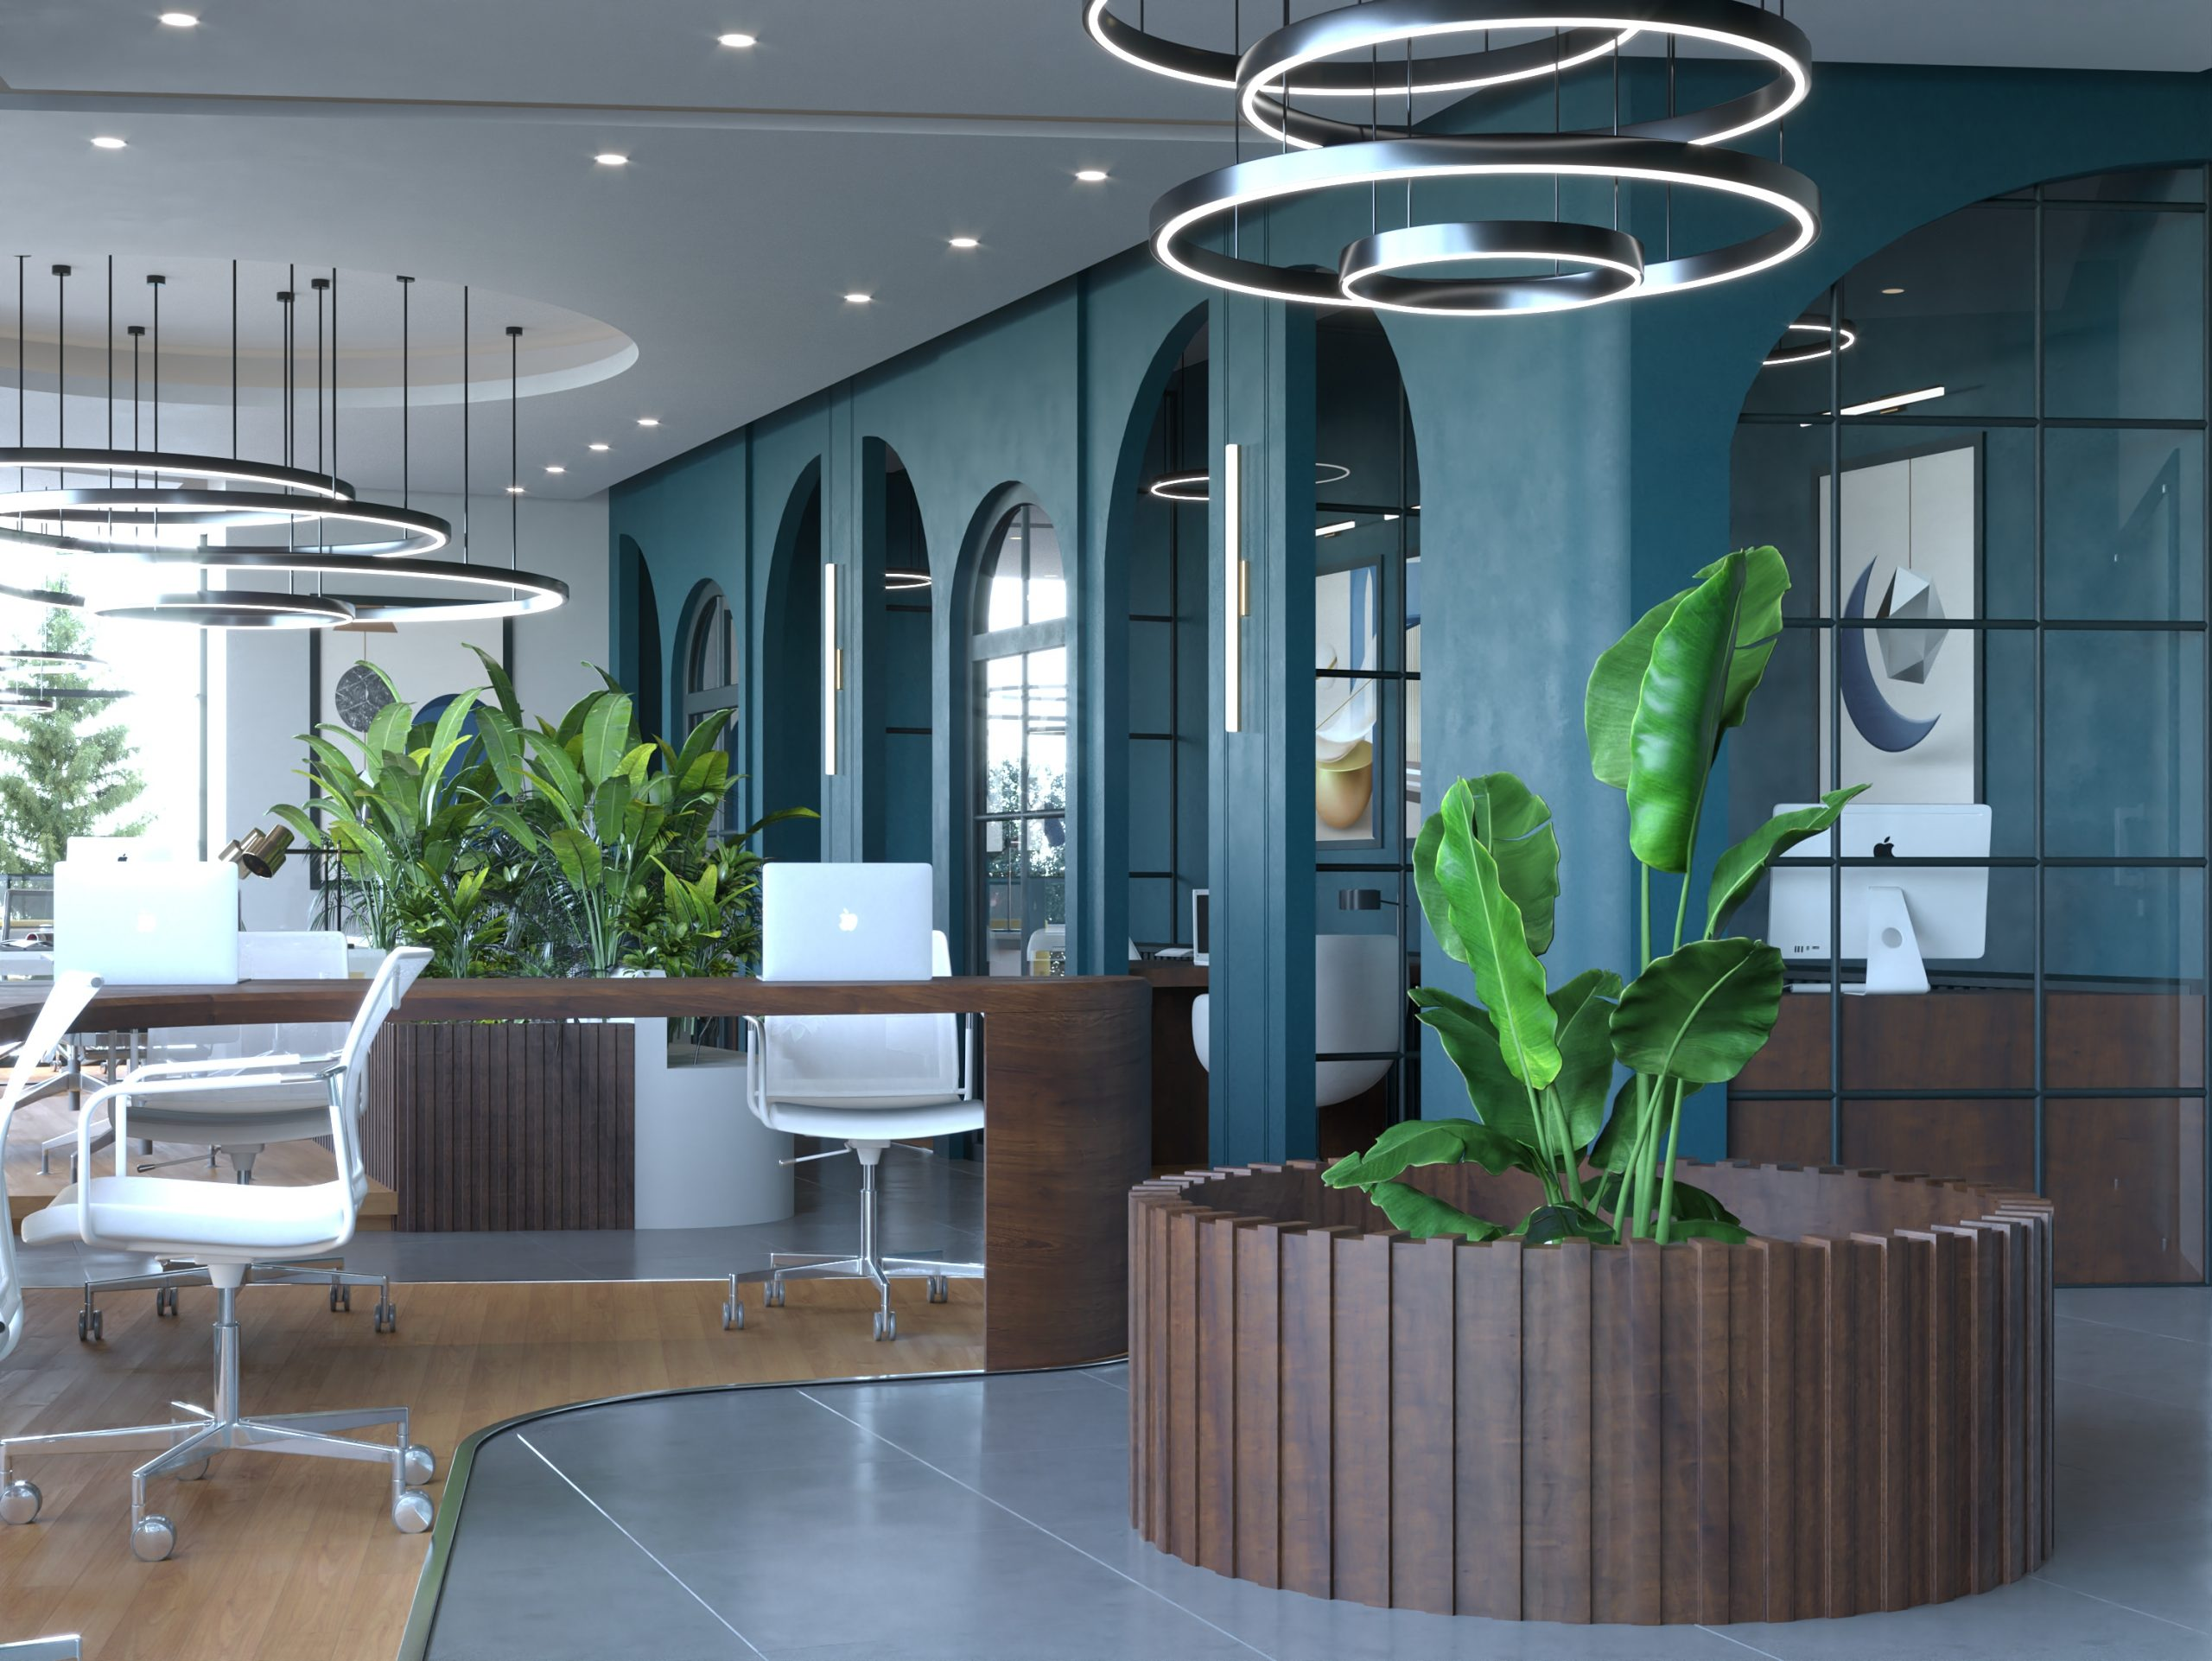 SHARIK HUB COMPANY DESIGN - PLANTS DECORATION - BIG TABLES - LIGHT WORK - MIXED DESIGN